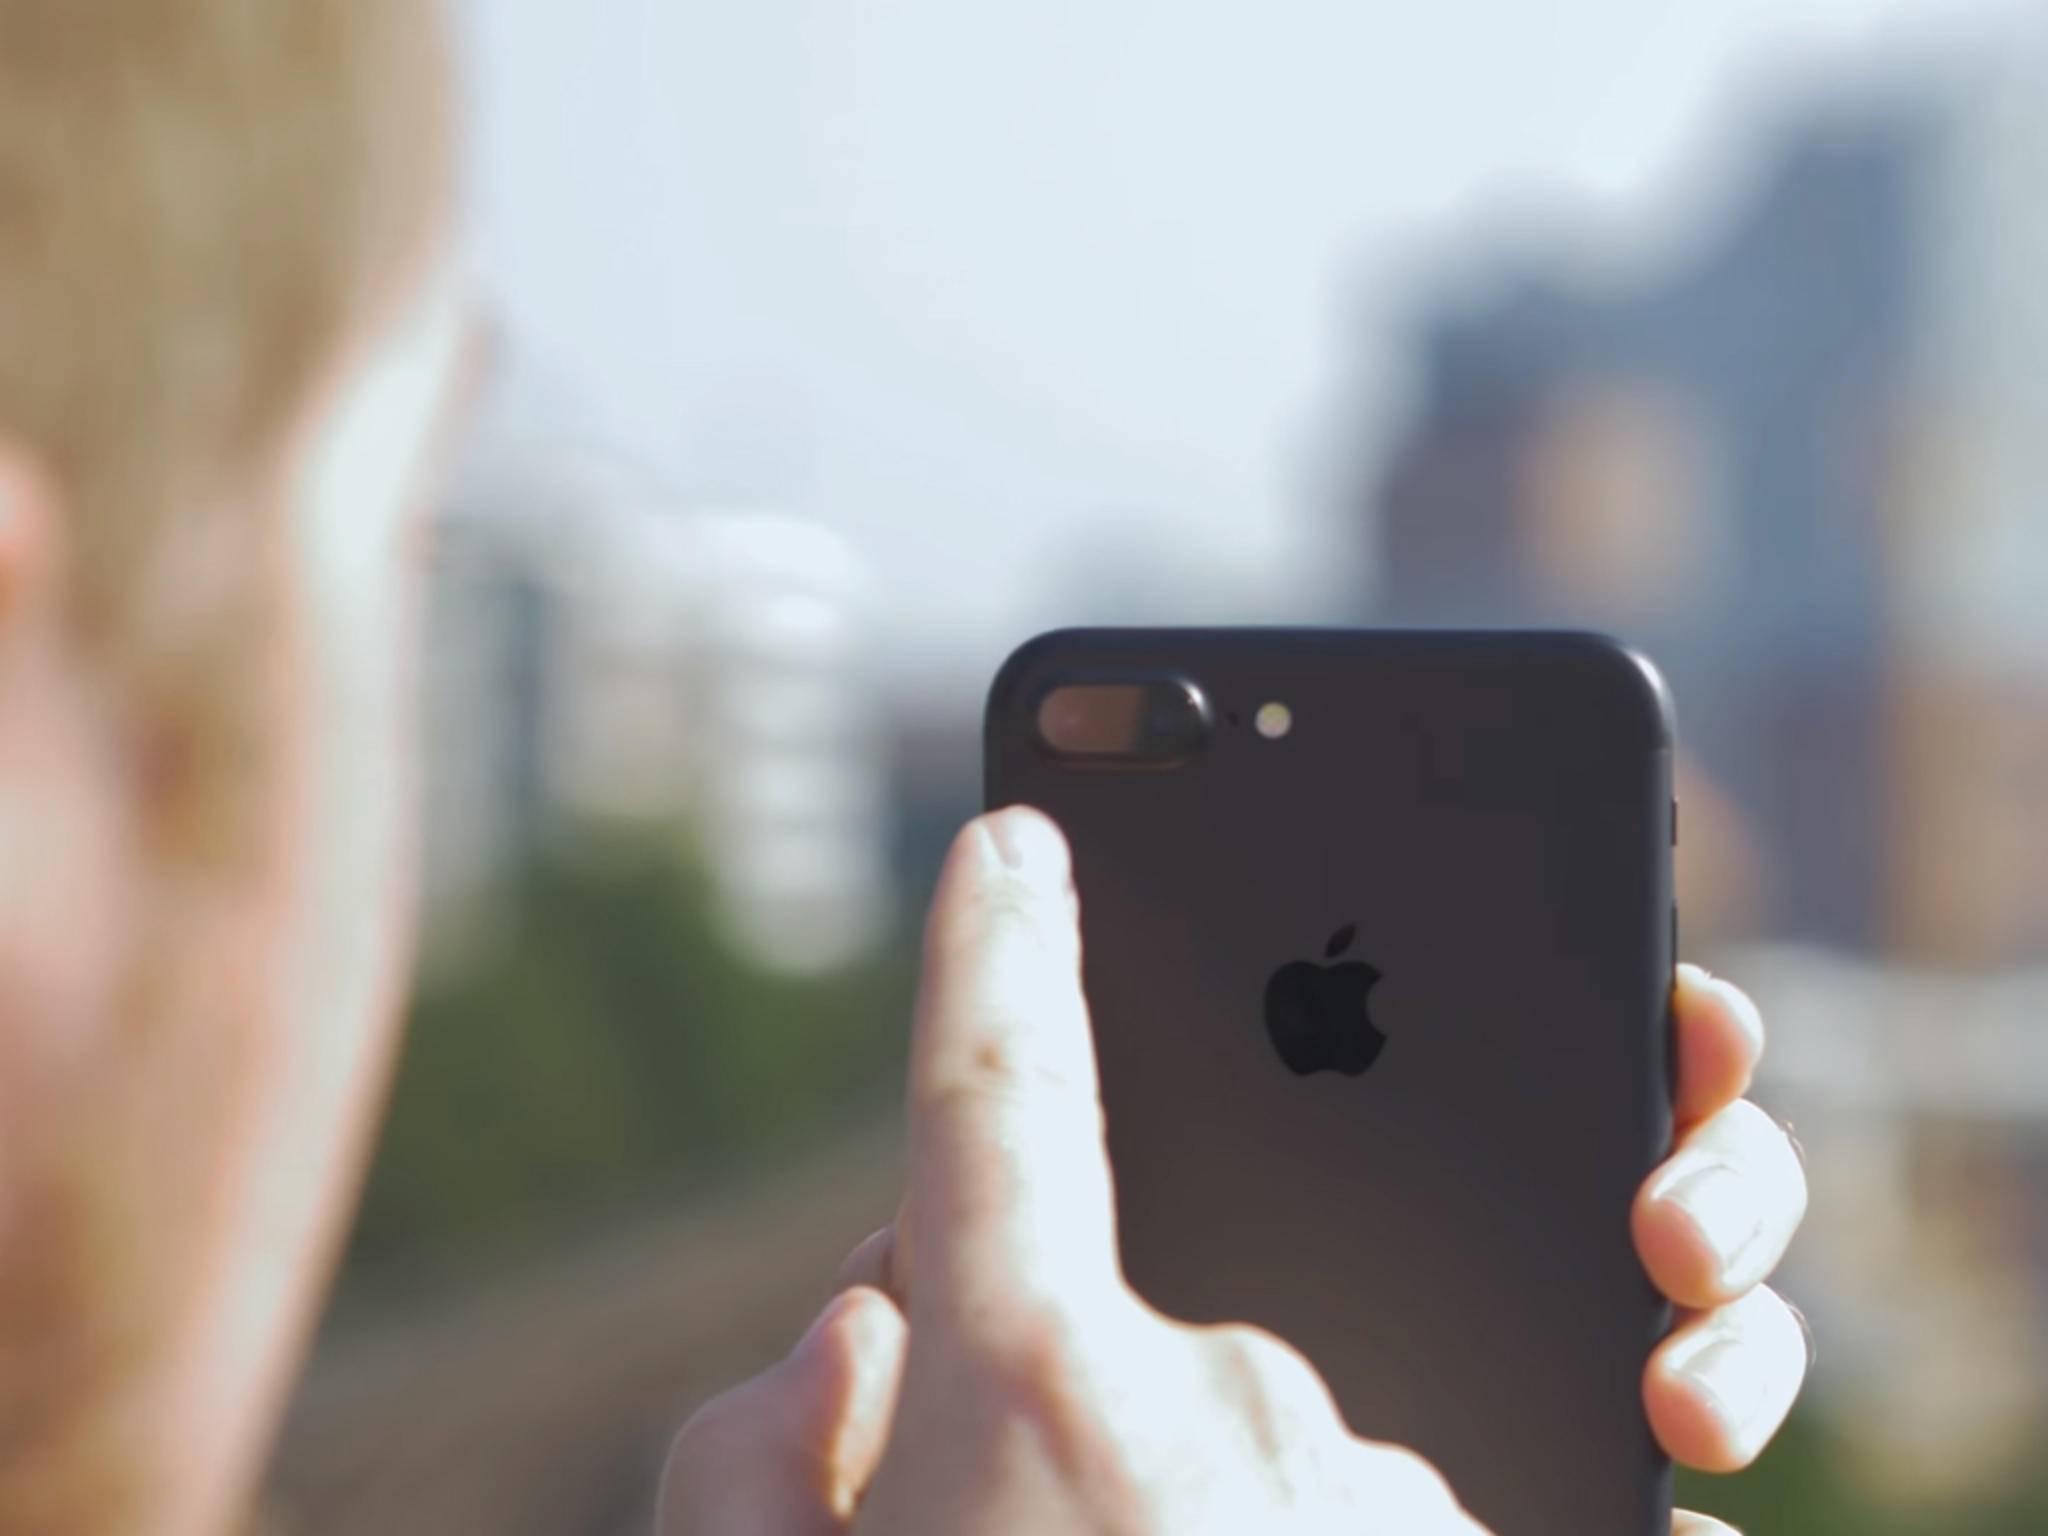 iOS 10.1 fügt dem iPhone 7 Plus den Porträt-Modus hinzu.